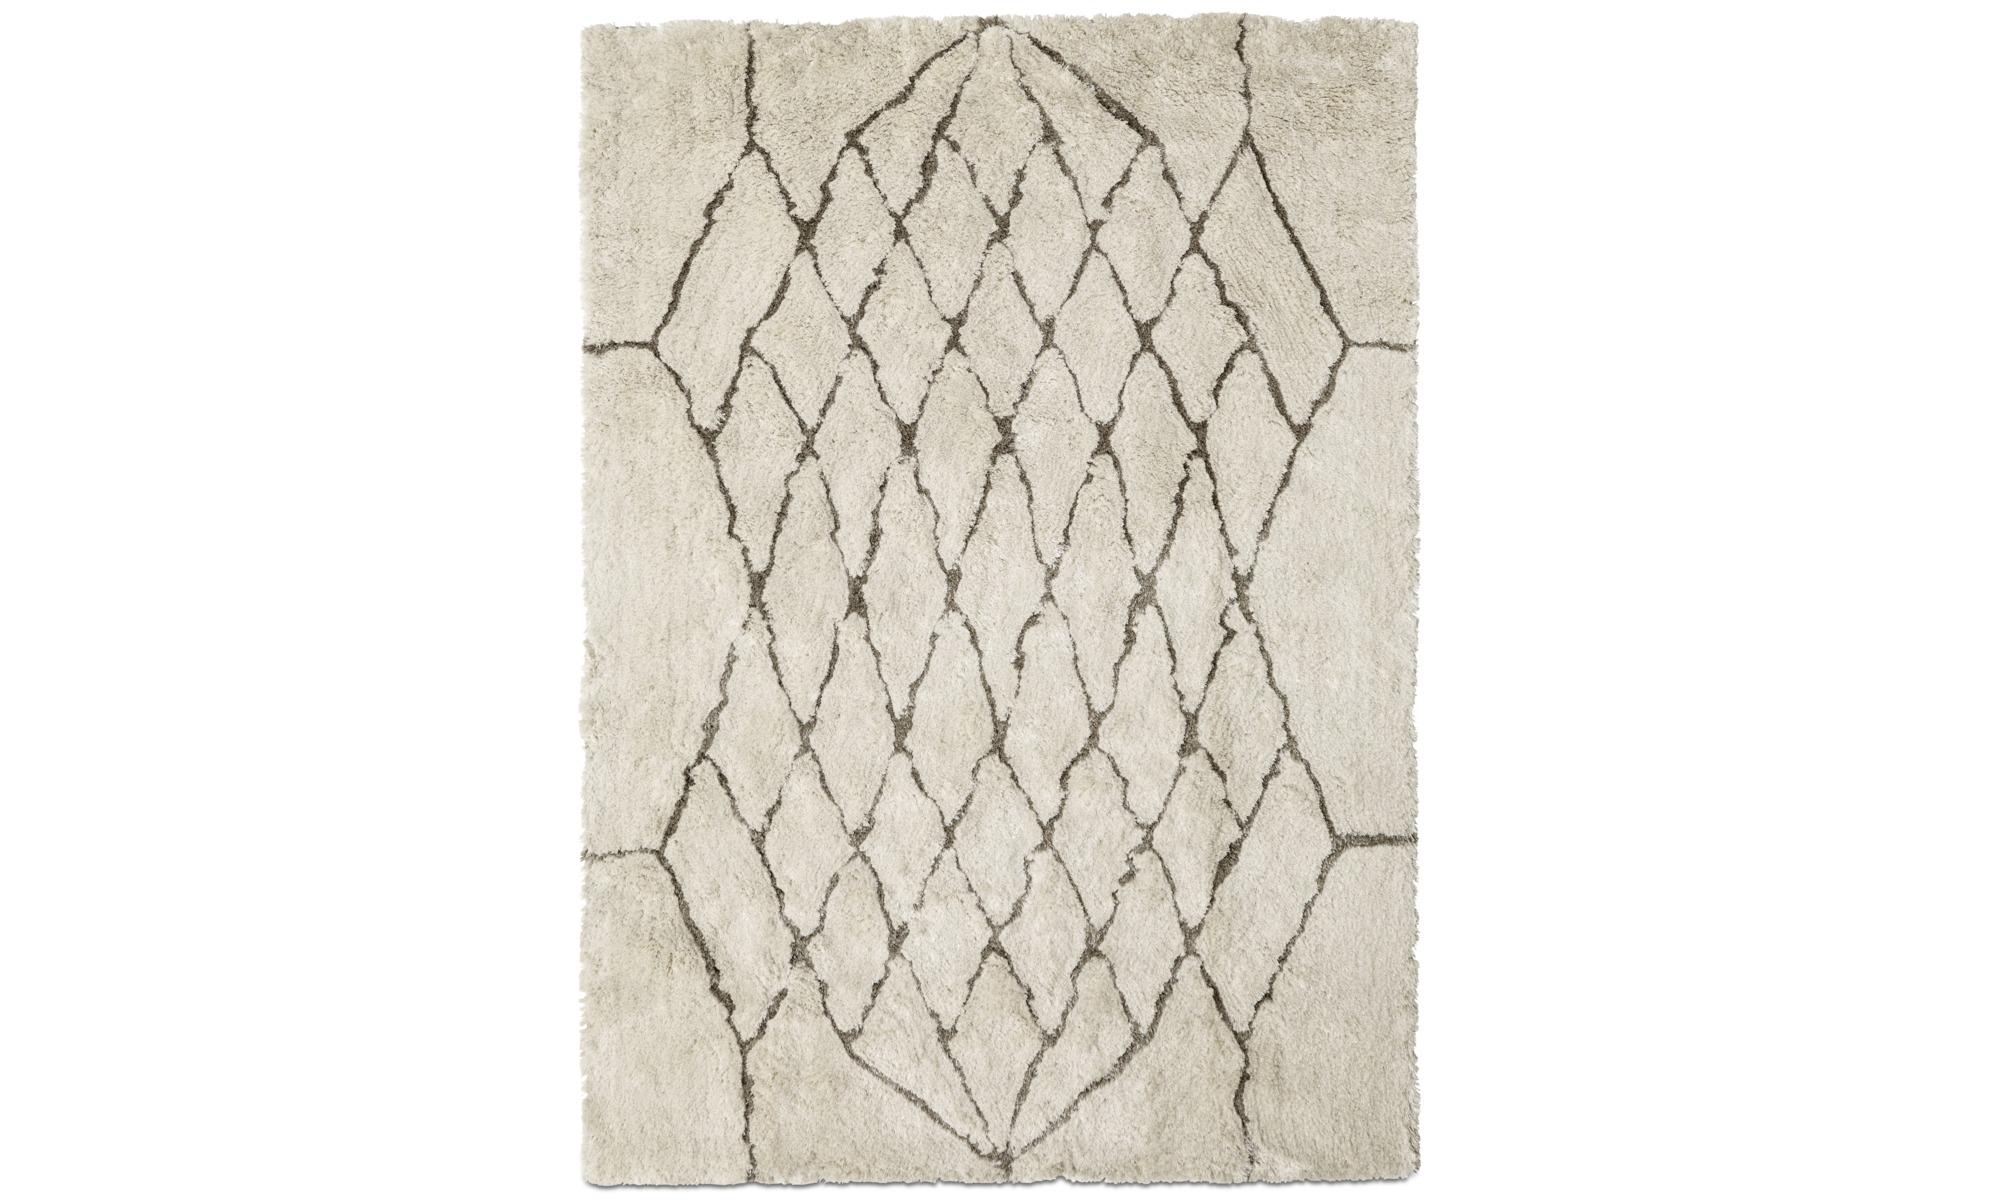 Rugs - Safi rug - rectangular - Beige - Fabric